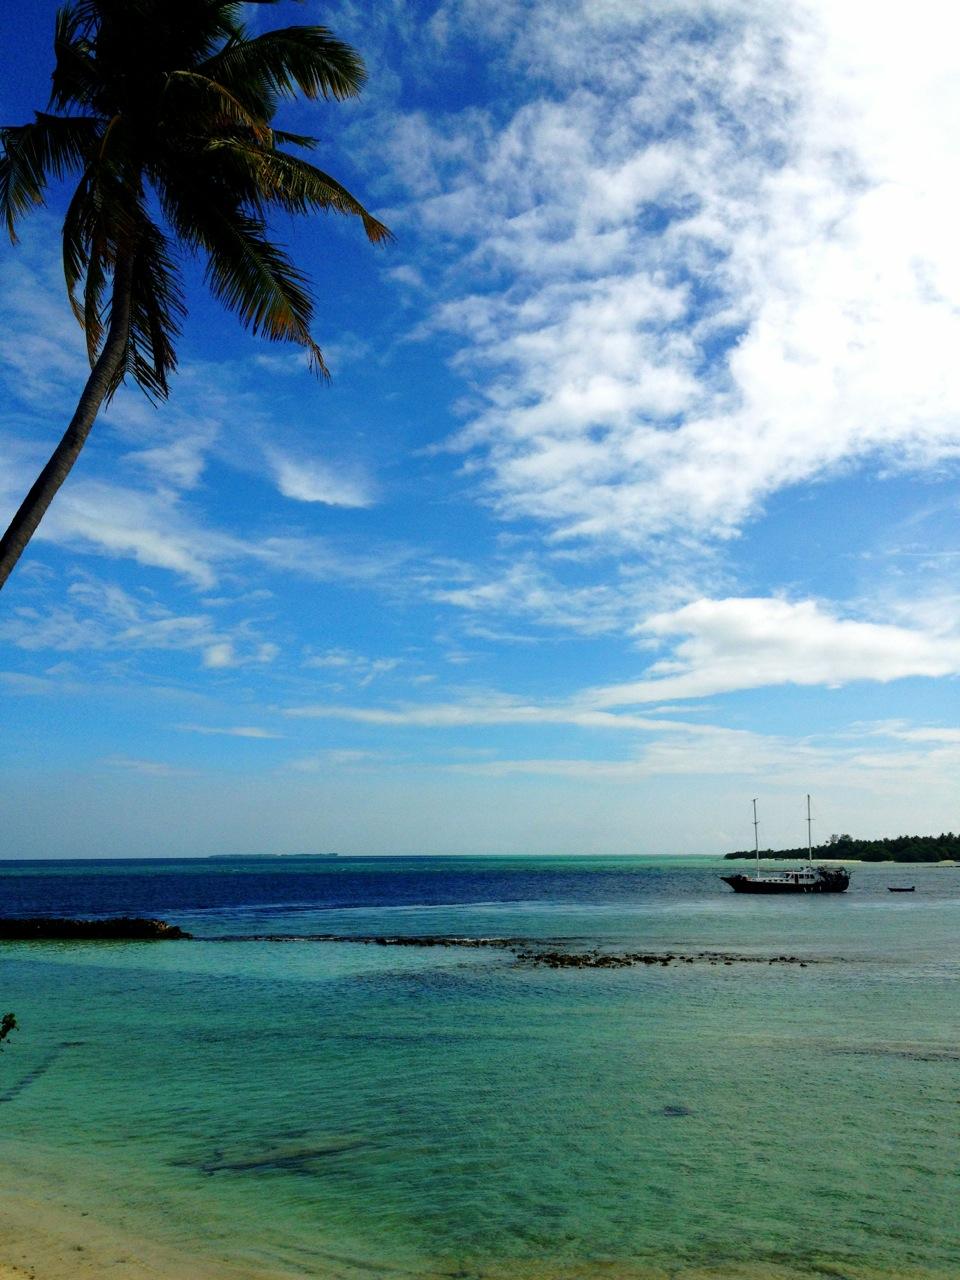 Maldives Part 1: Budget Surf Spot